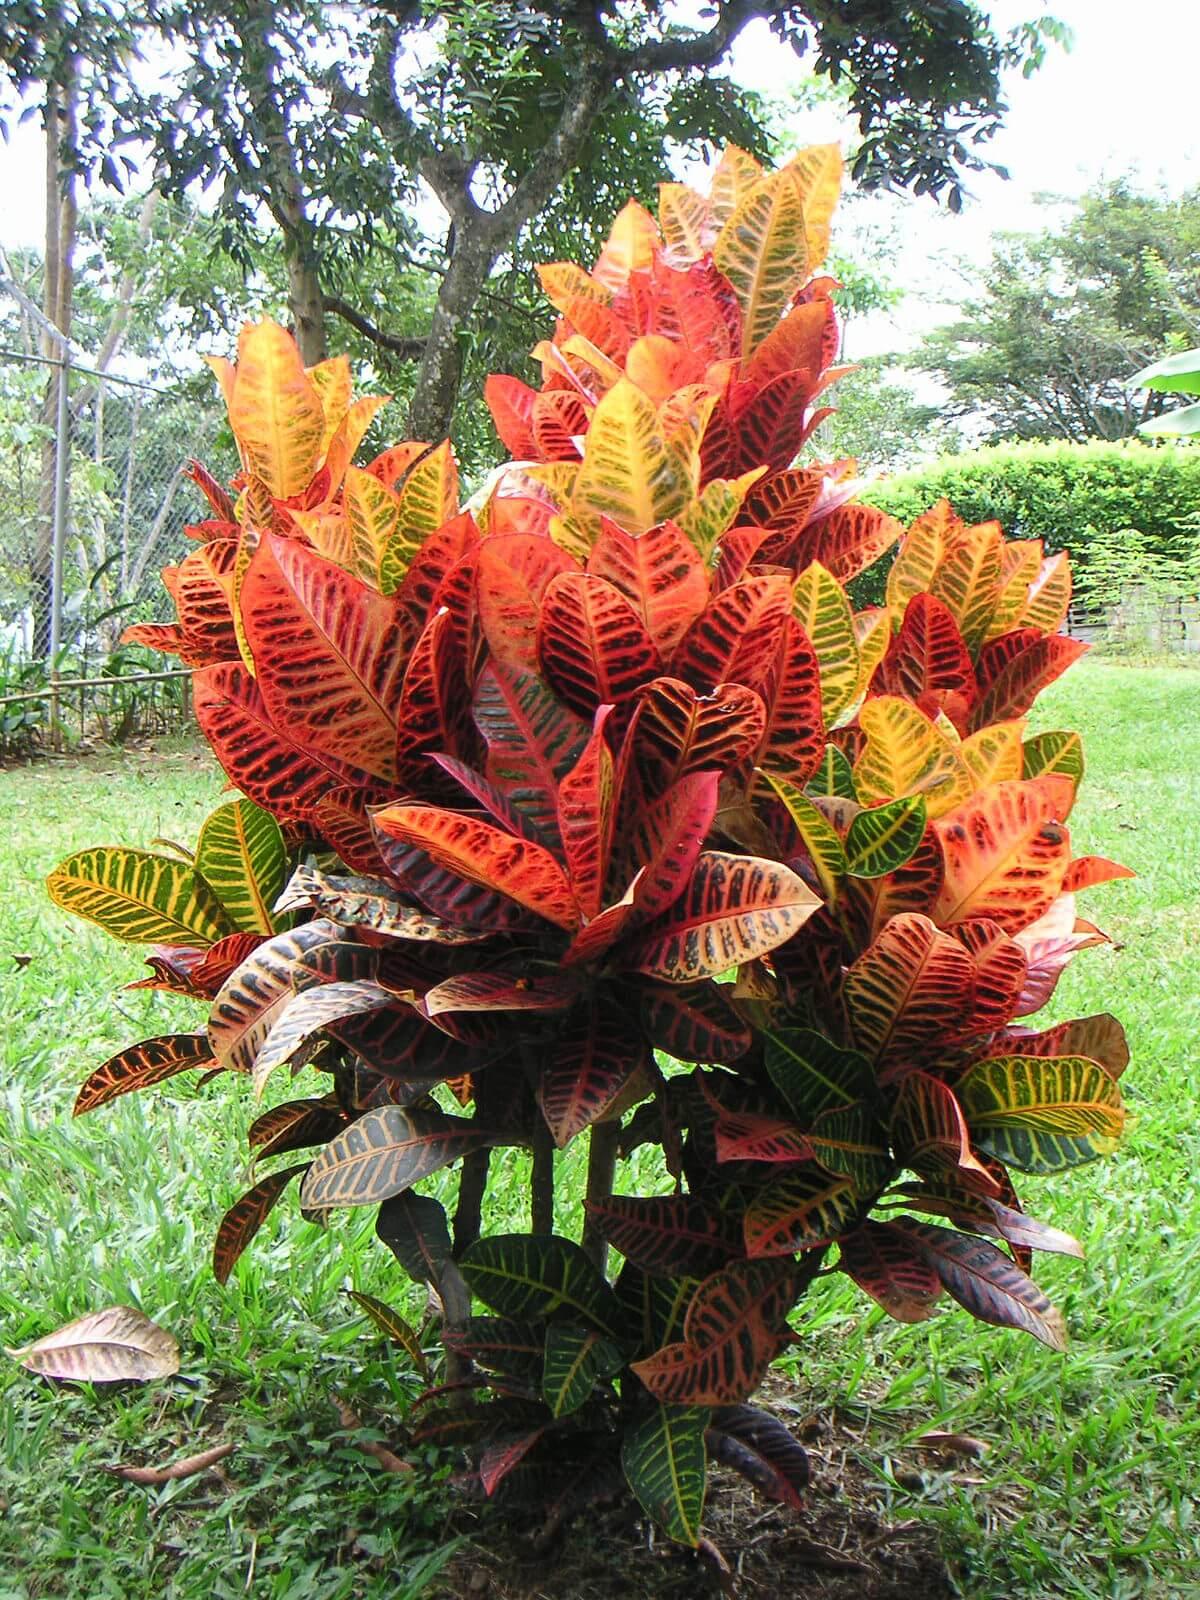 7 Cara Menanam Bunga Puring Agar Cepat Berakar Dan Tumbuh